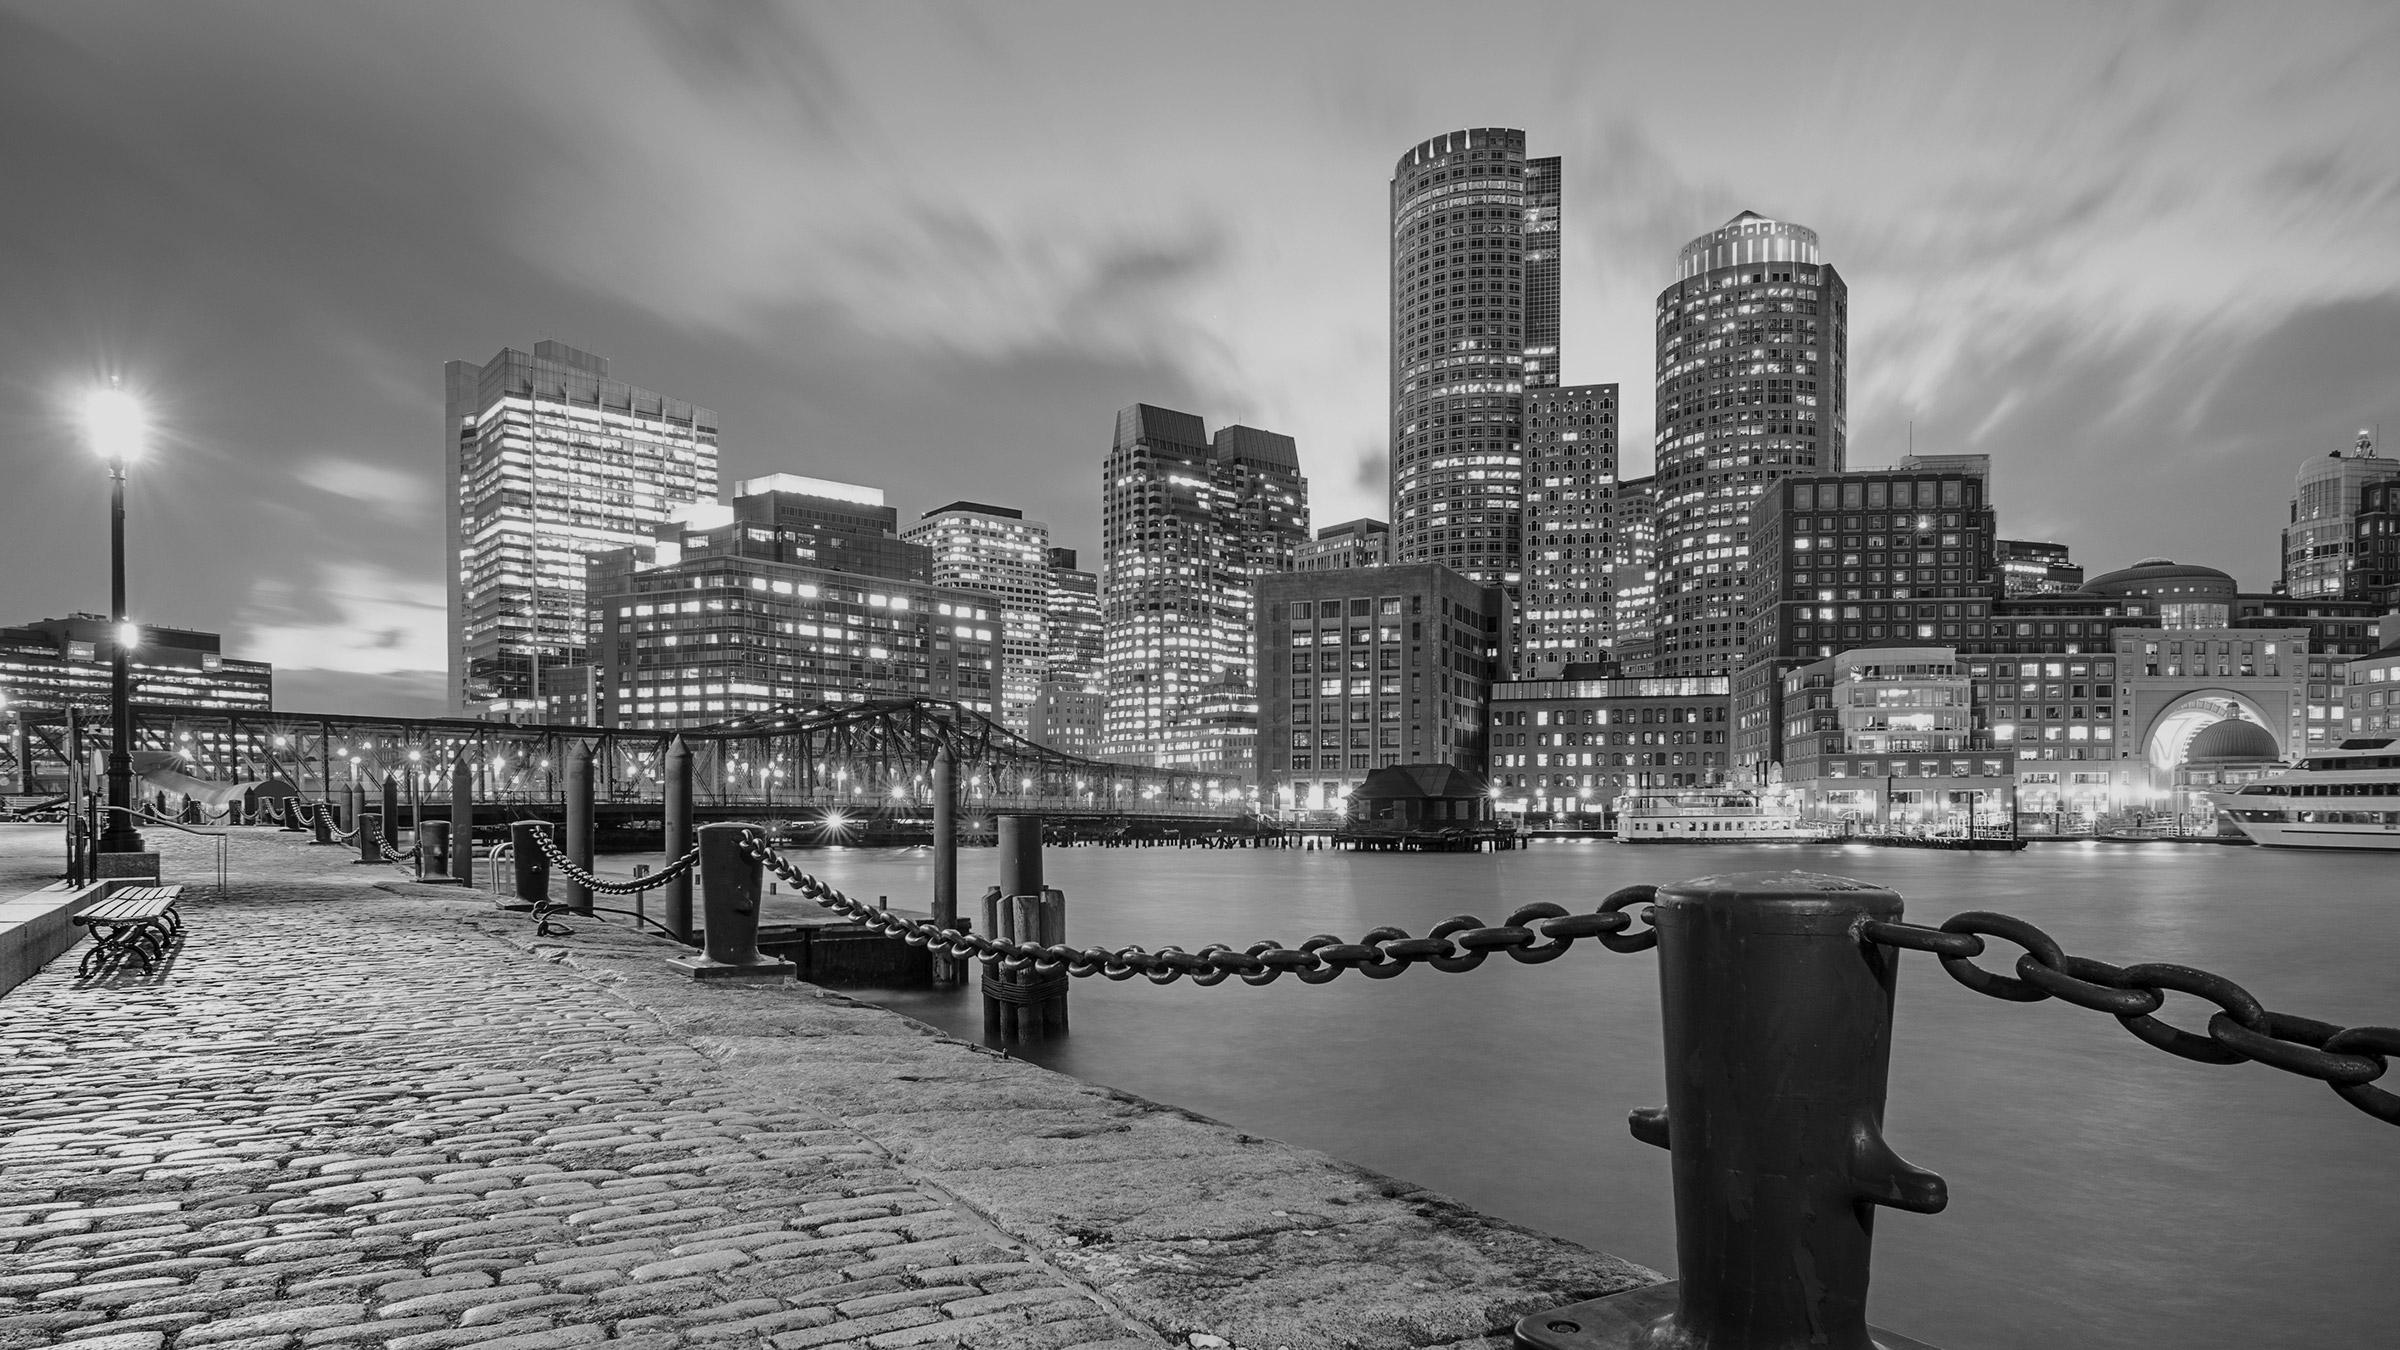 Boston Skyline view from across Boston Harbor.